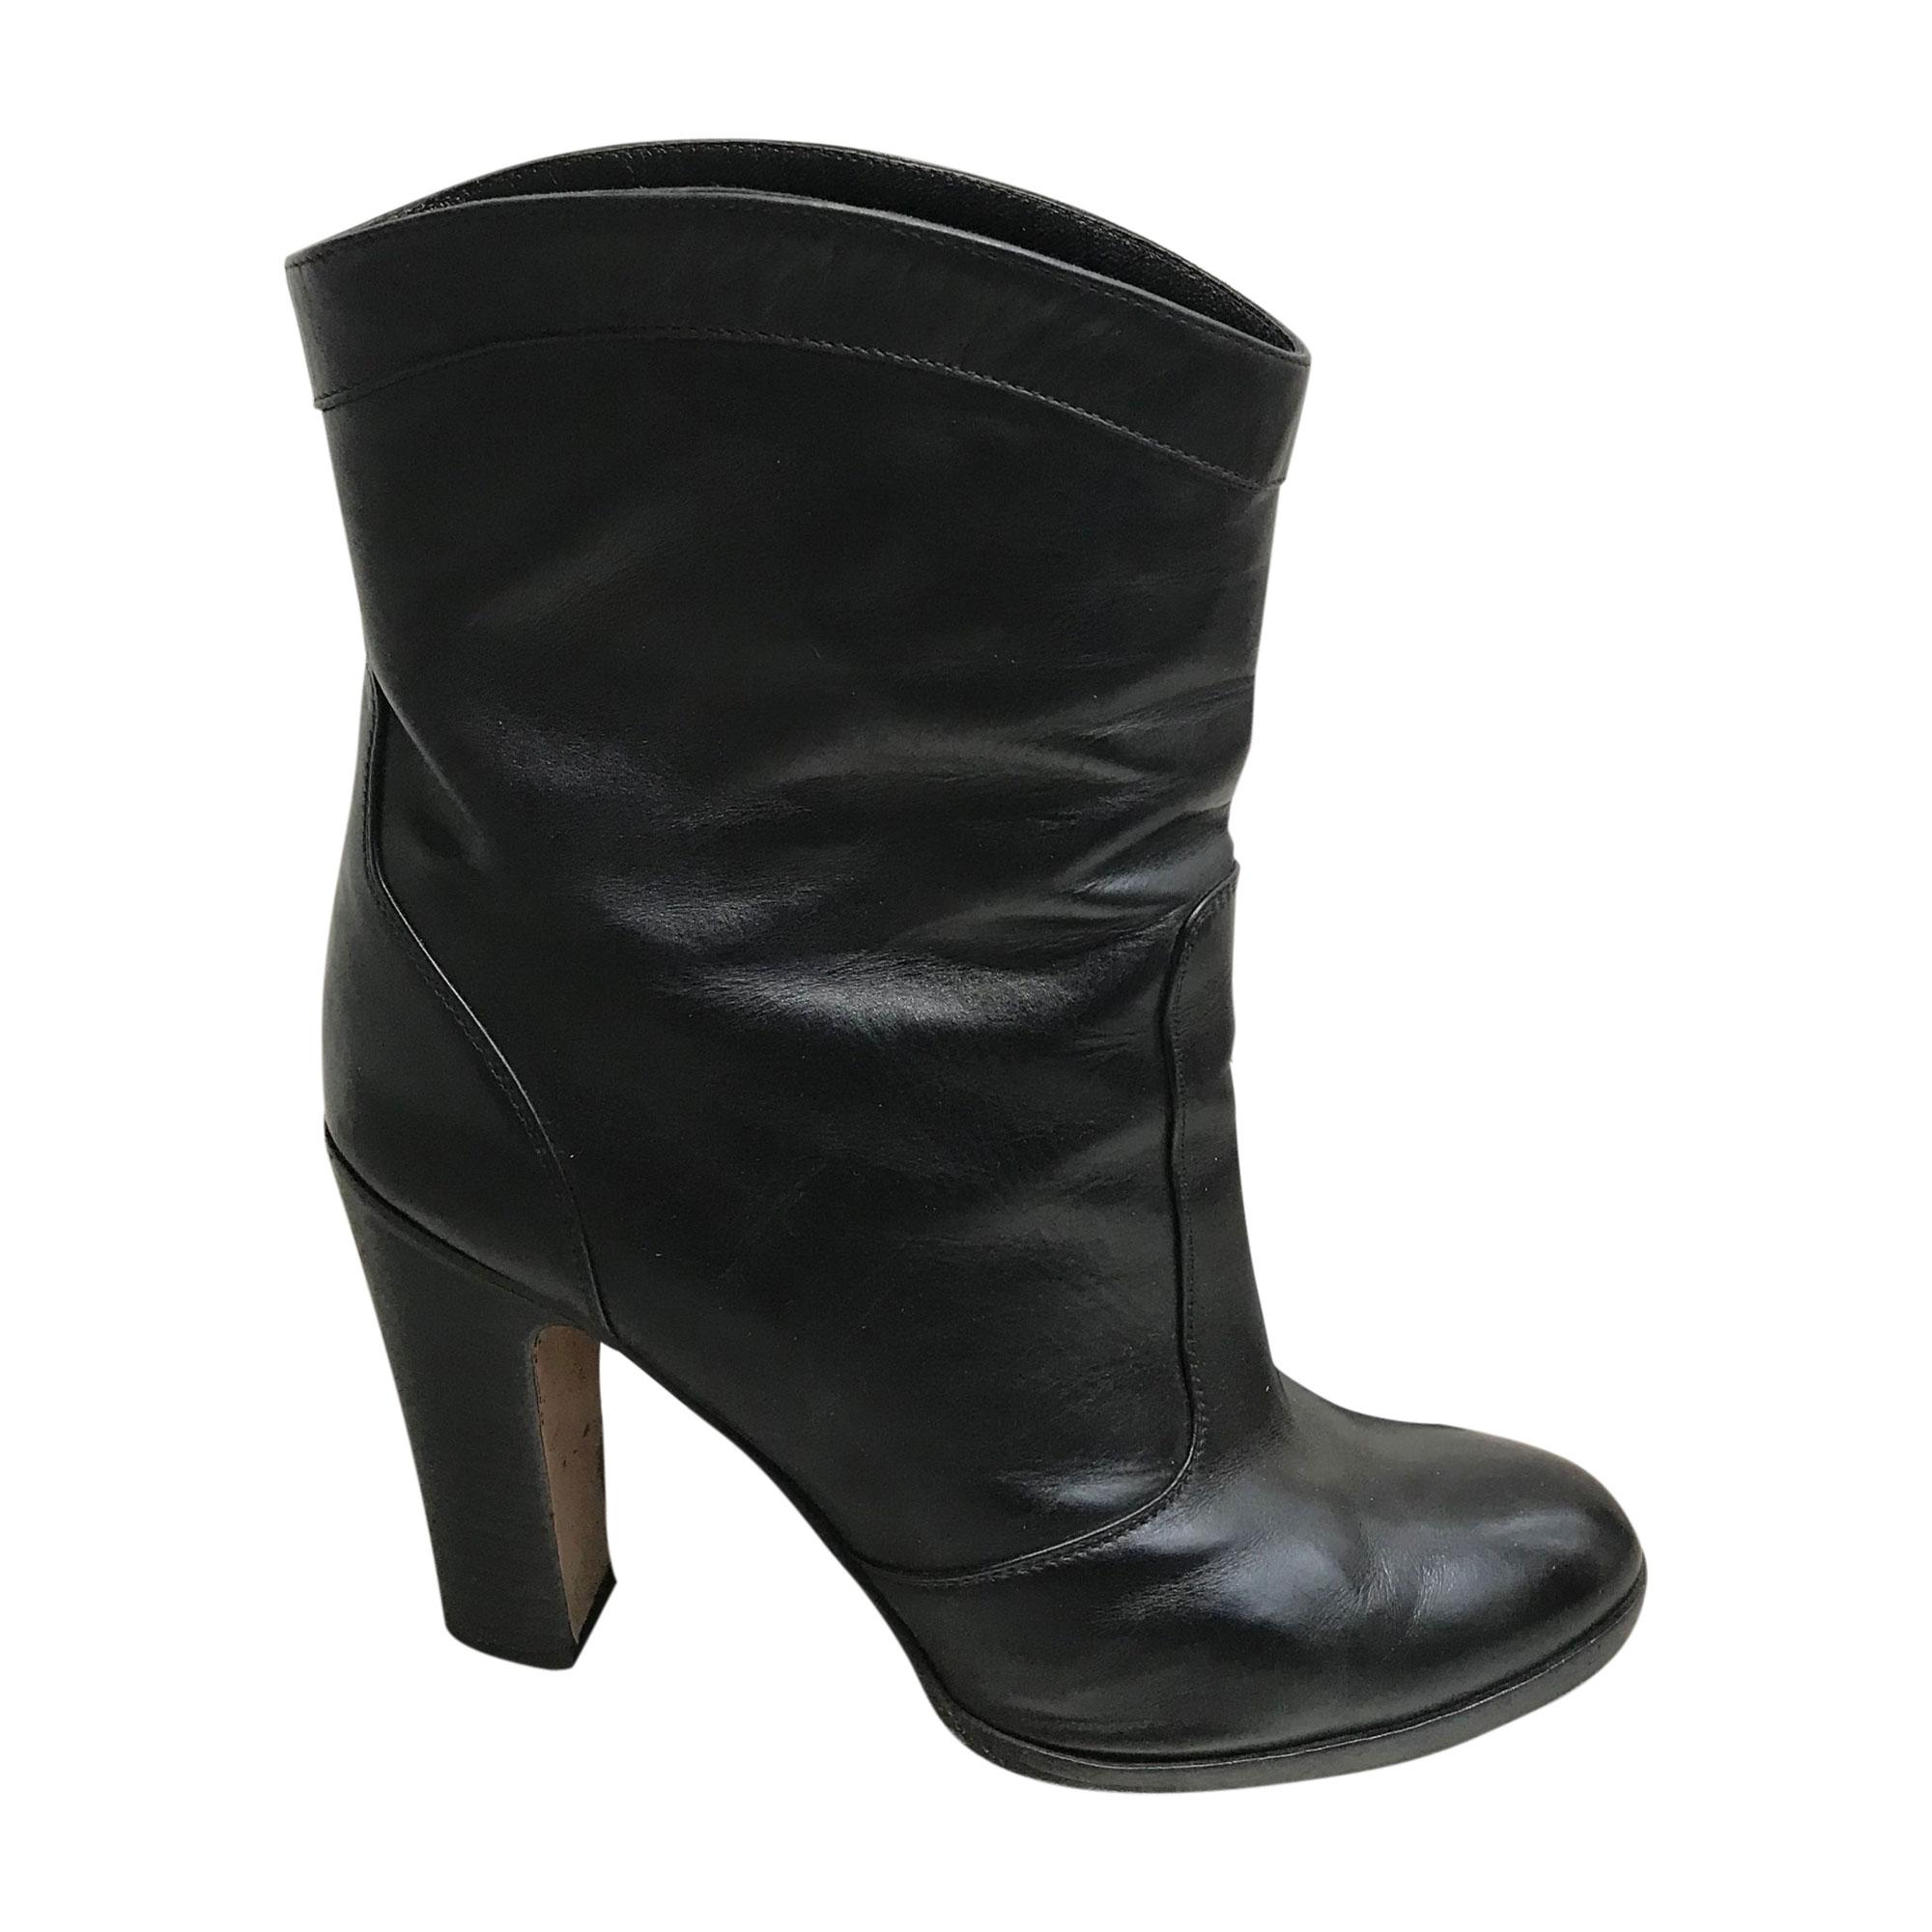 Bottines & low boots à talons GIANVITO ROSSI Noir